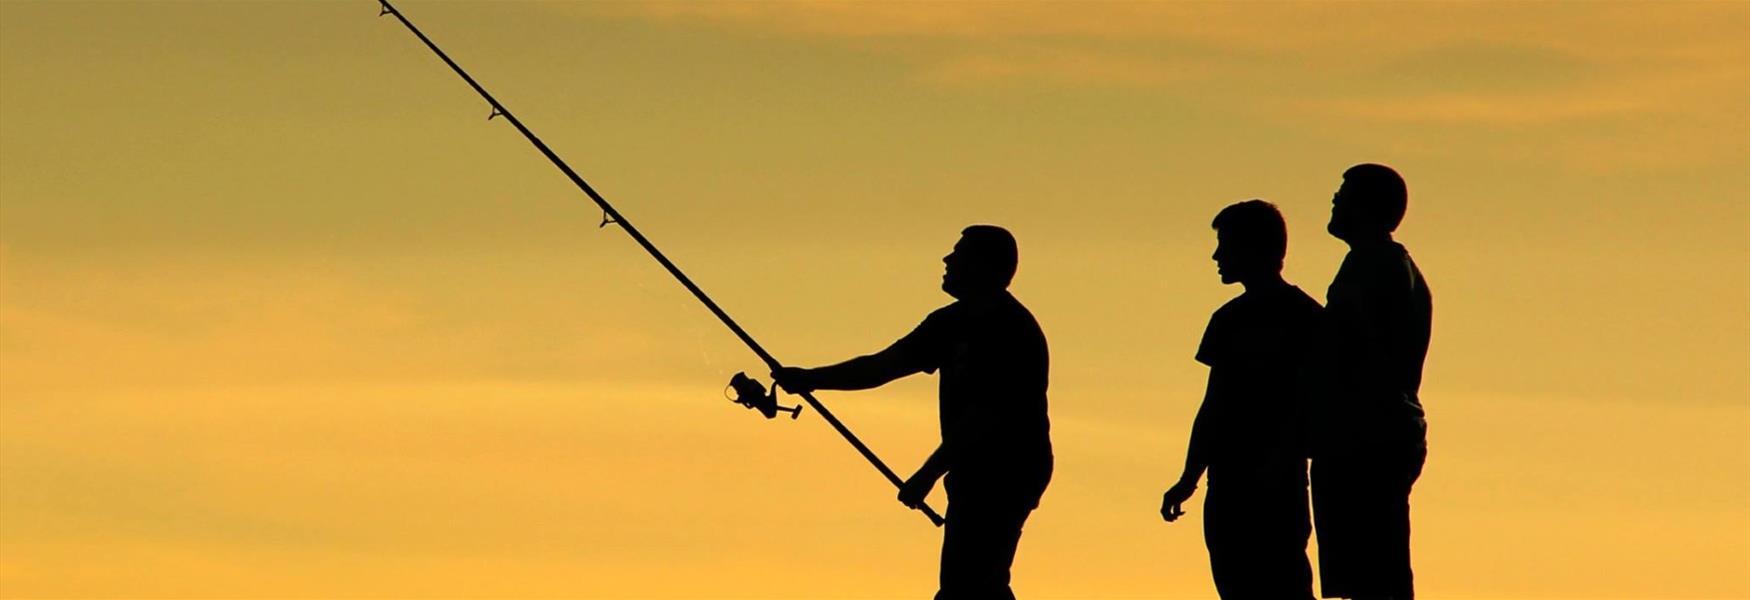 Fishing visit plymouth for Fishing r us